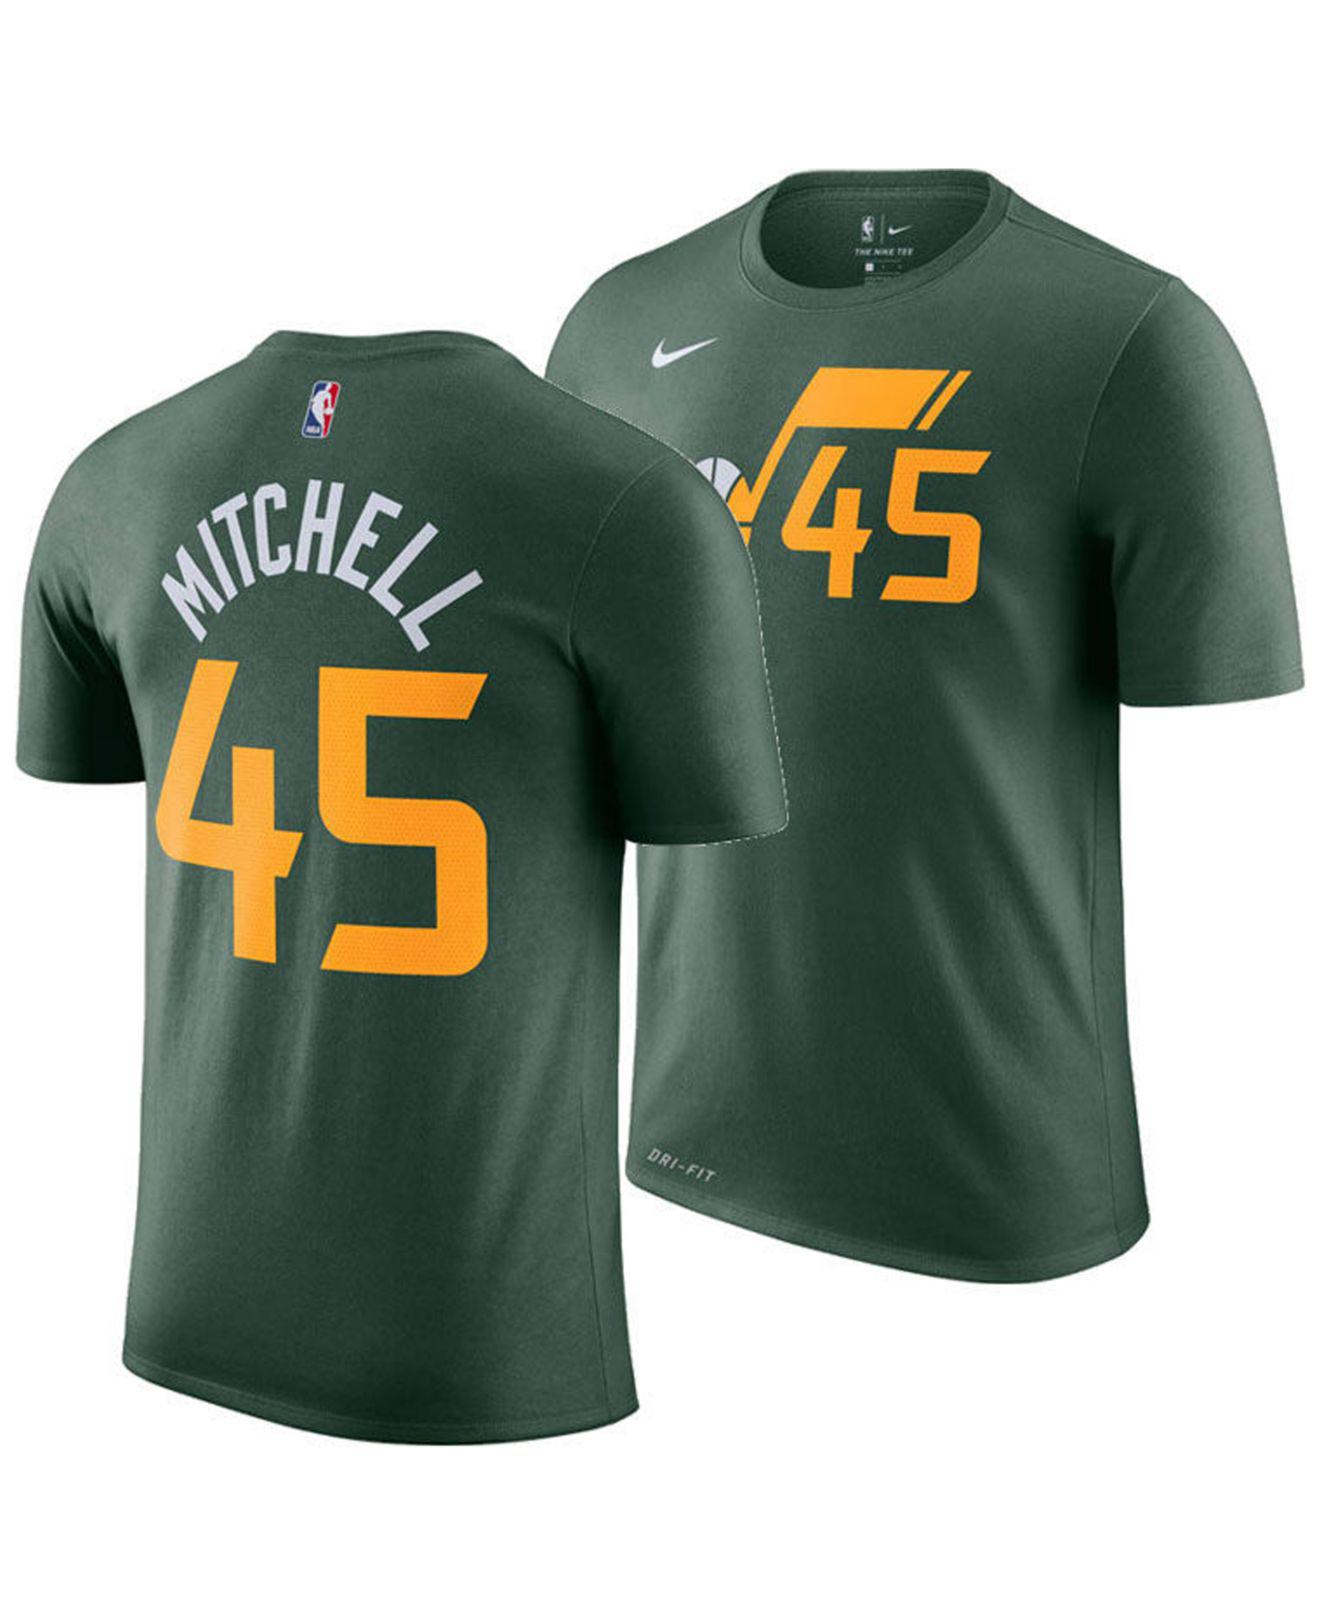 new products 6dcd9 c9e2b Men's Green Donovan Mitchell Utah Jazz Earned Edition Player T-shirt